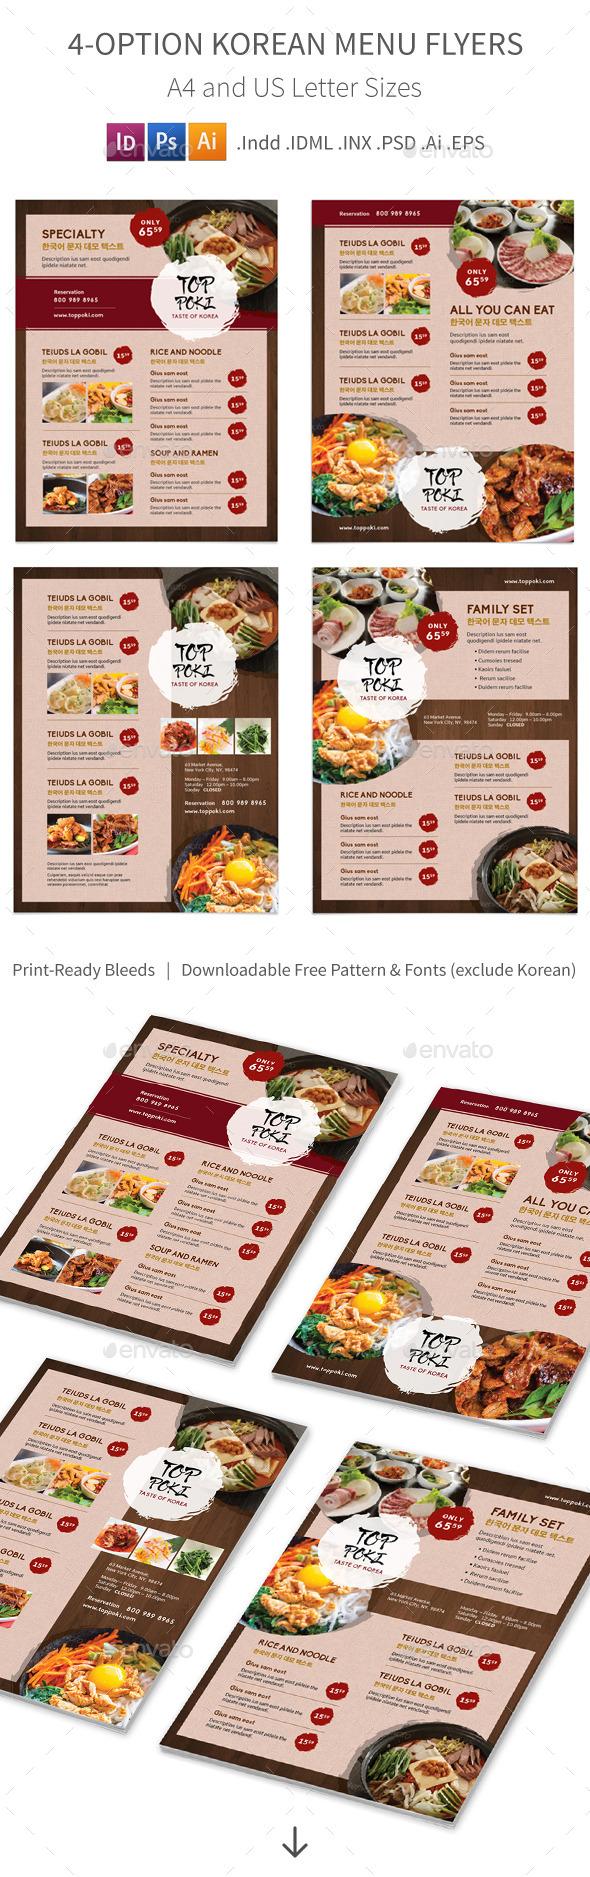 Korean Restaurant Menu Flyers – 4 Options